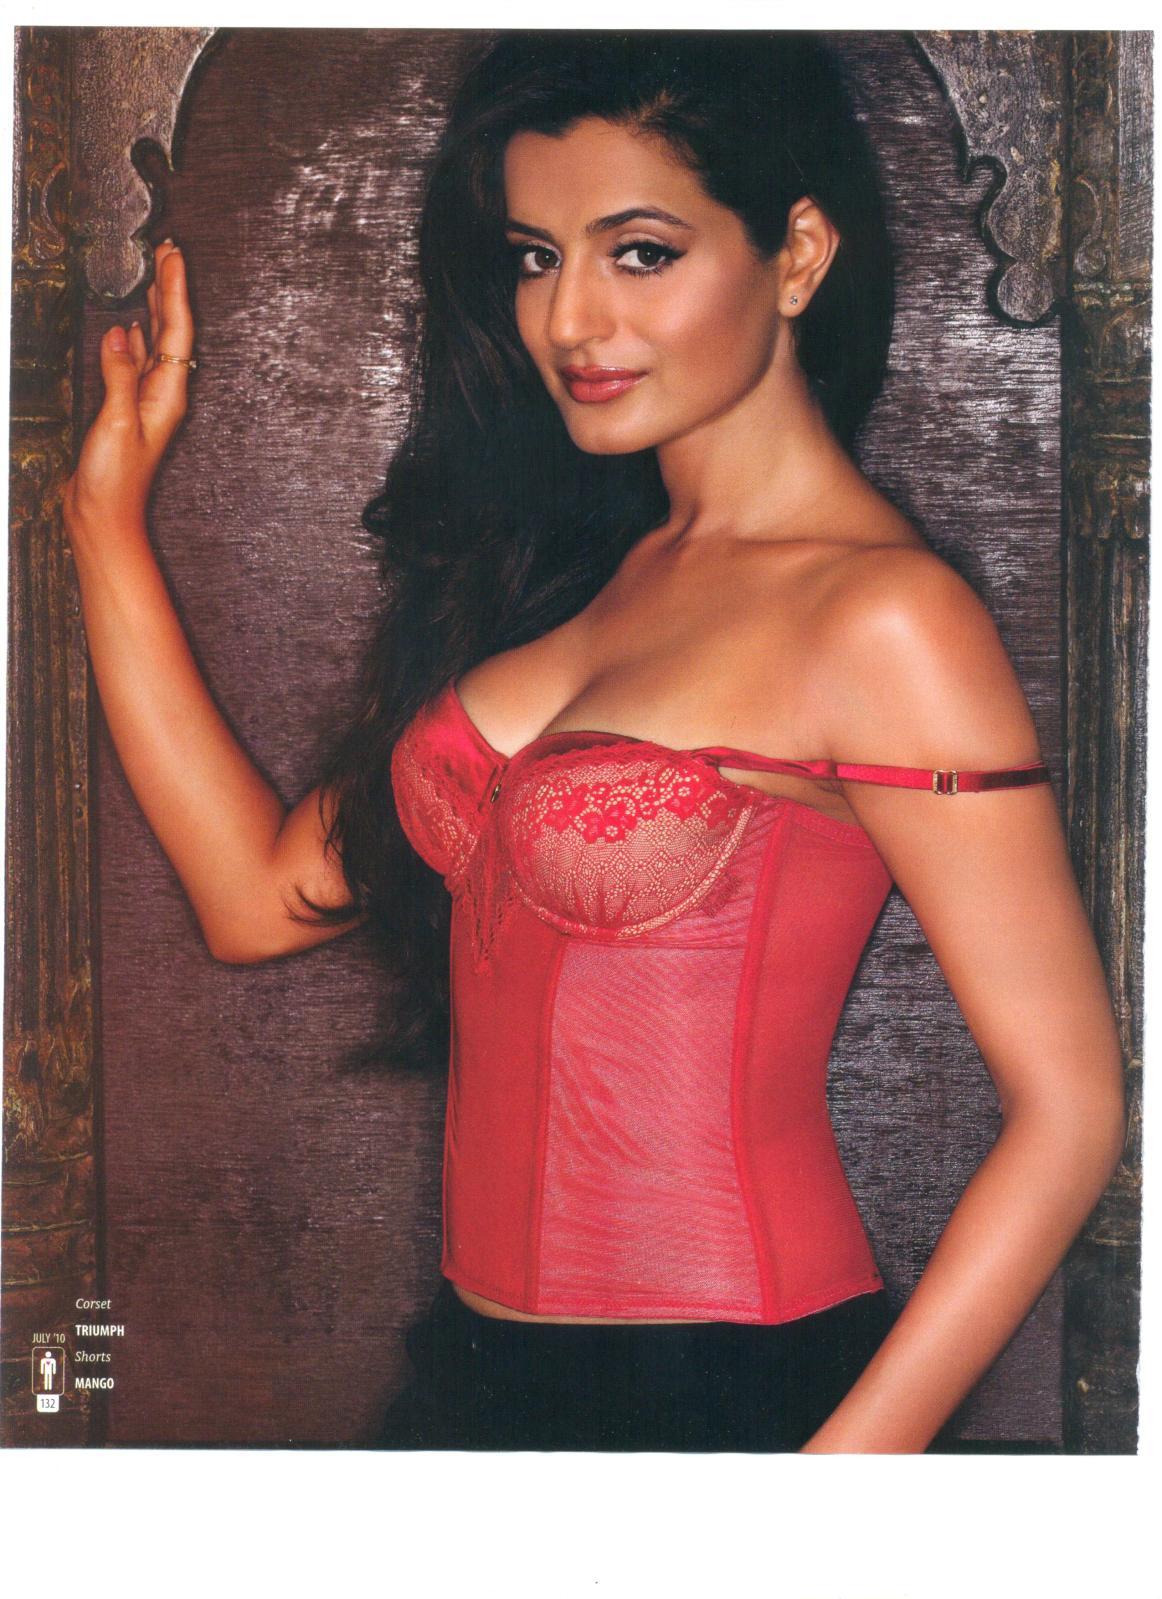 Amisha Patel Hot Boobs Pics kalimaseks: amisha expoed hot boobs in ever scene hot girl